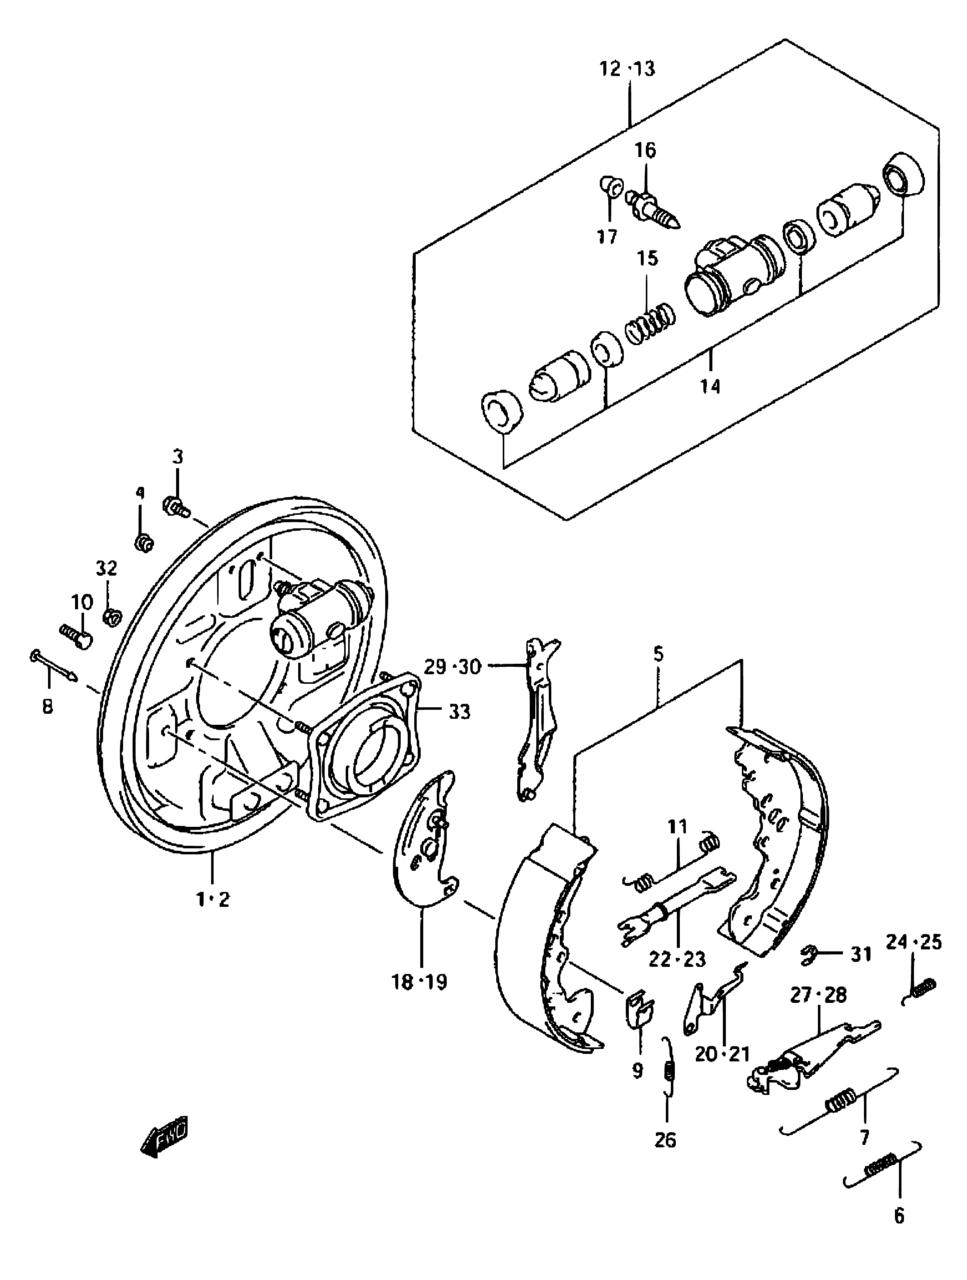 Rear Wheel Bearing Quesiton